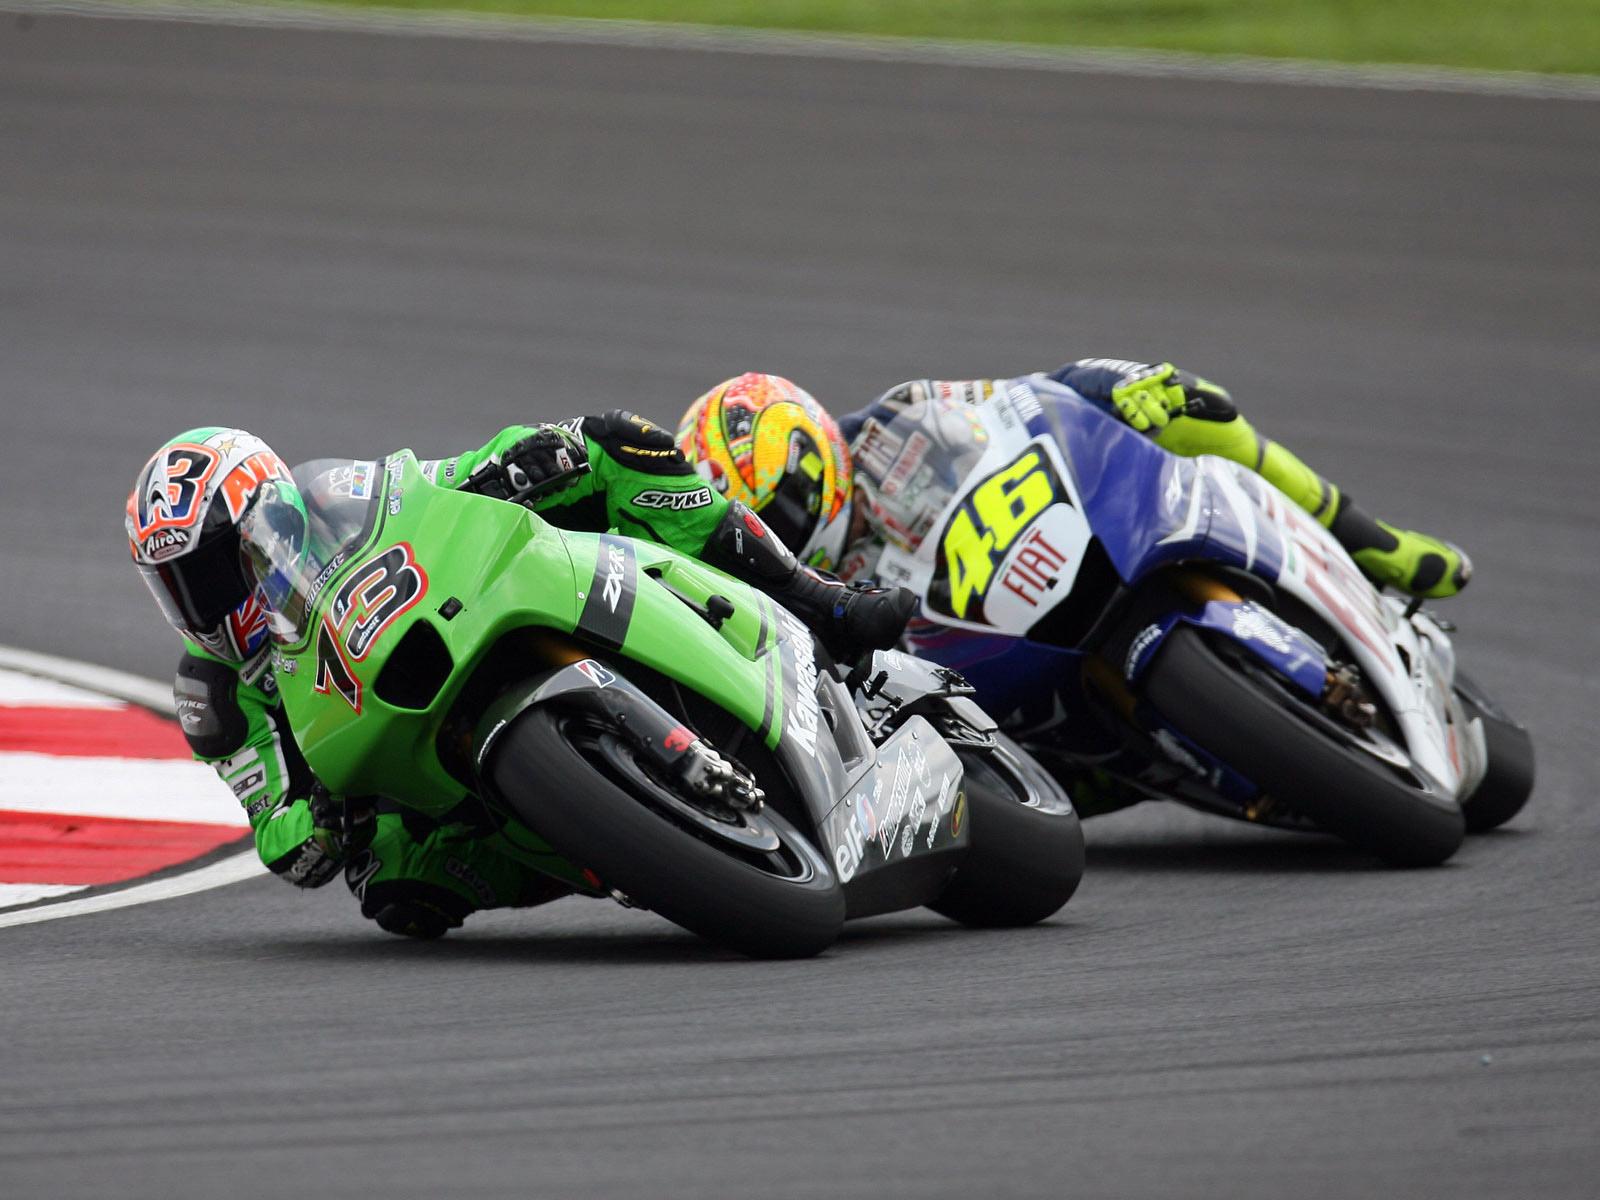 Download High quality turn MotoGP Wallpaper Num 25 1600 x 1200 1600x1200